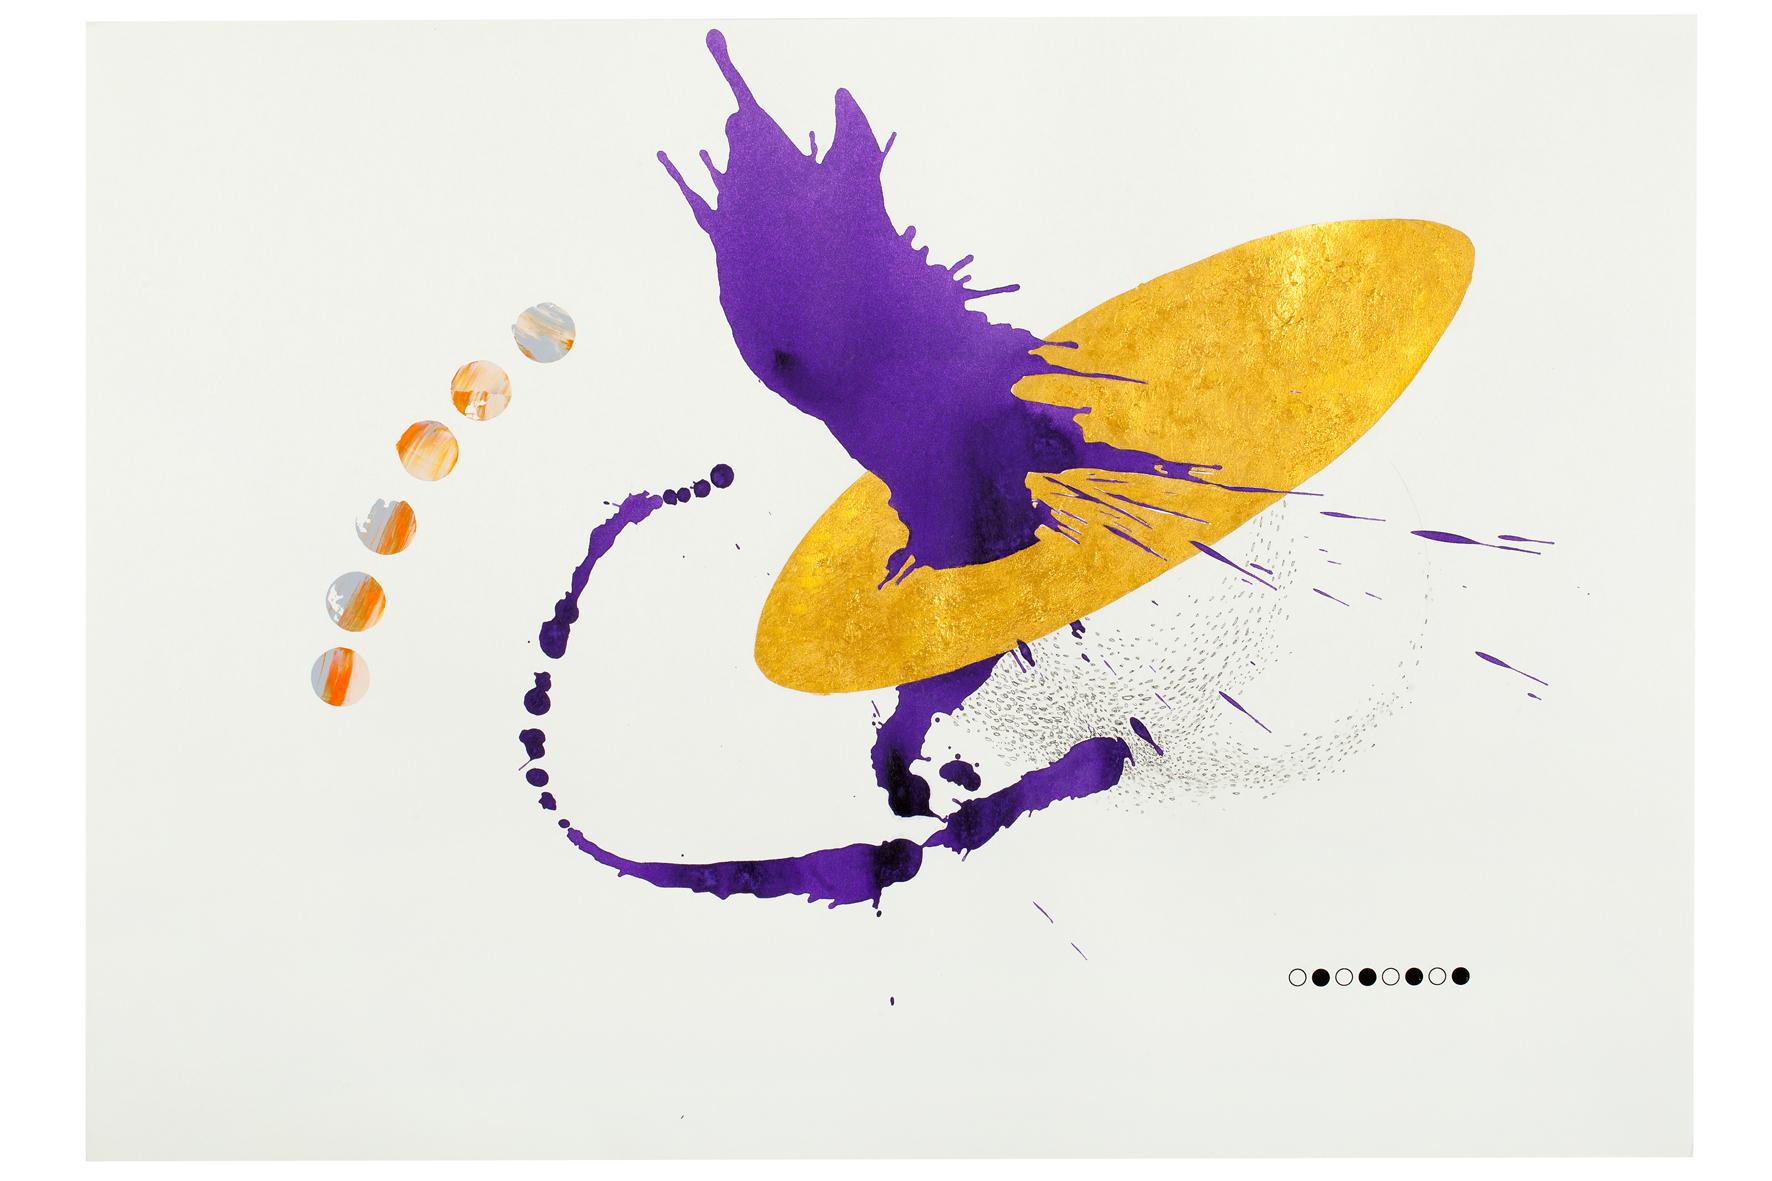 Purple ink series #10  ink, acrylic, pen, pencil, gold powder on paper  59.5x42cm  2018